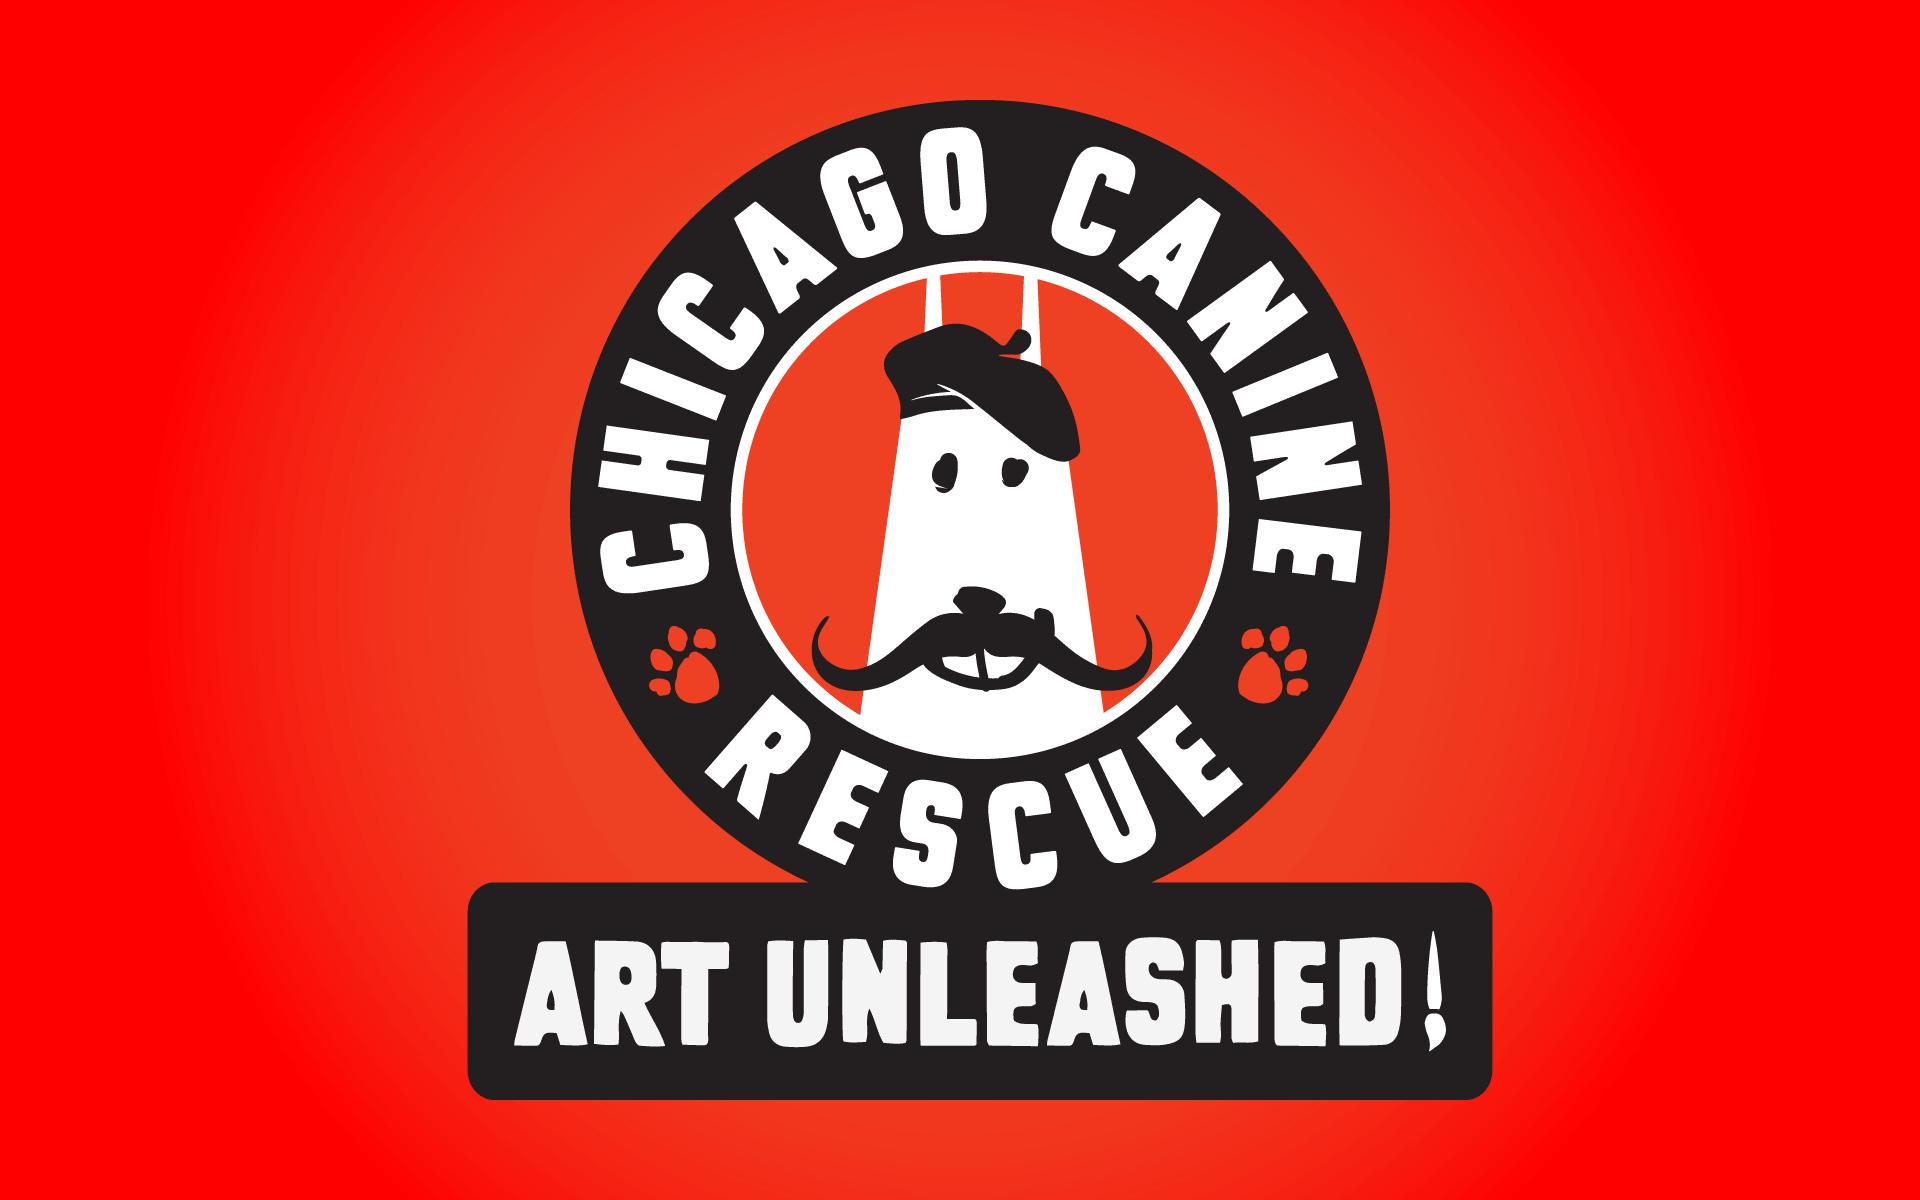 Chicago Canine Rescue Art Unleashed! Logo